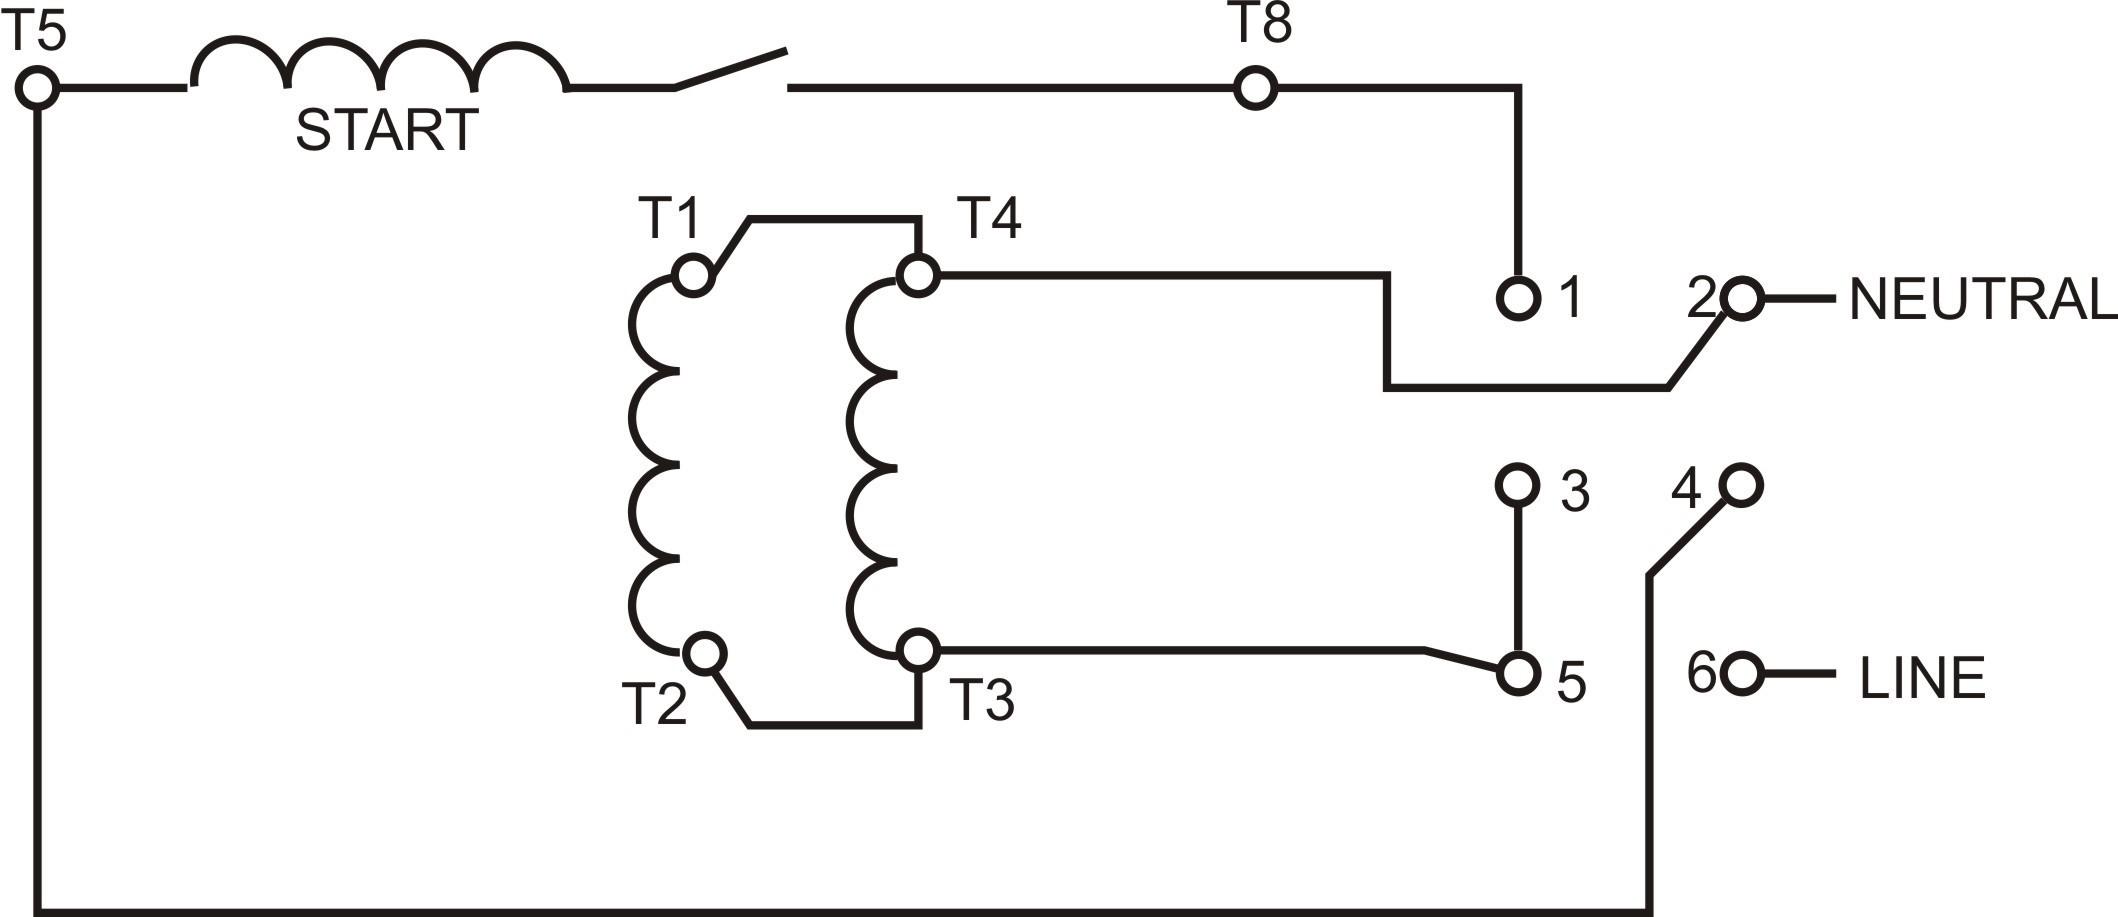 240 Volt Wiring Diagram Beautiful Dayton Electric Motor Wiring Diagram & Gallery Leeson Motor